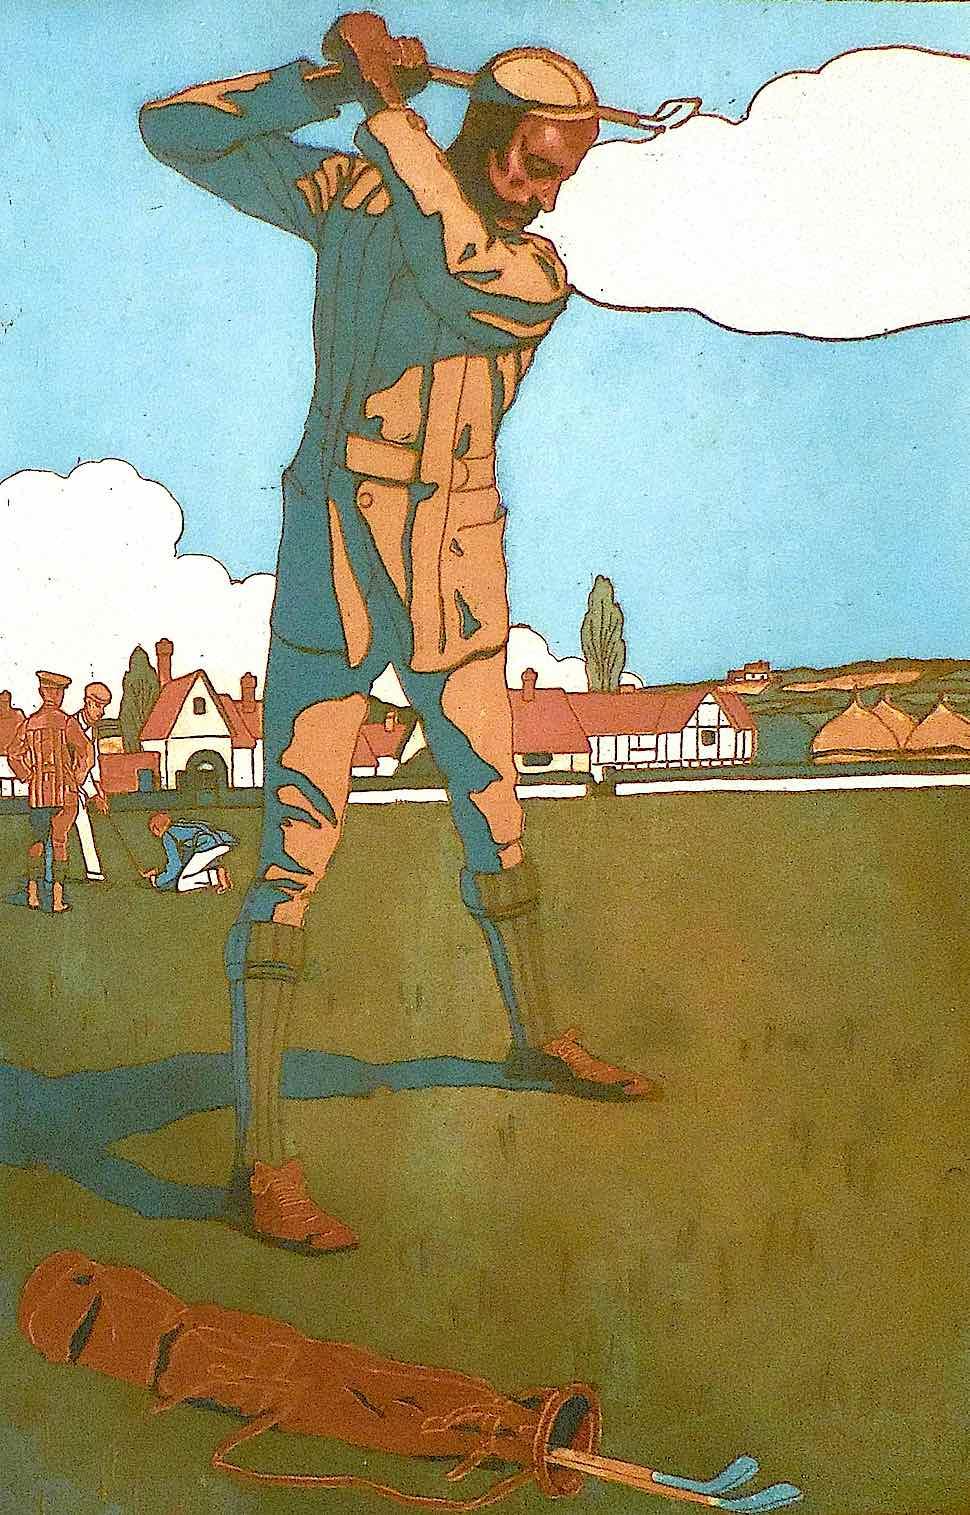 a Bernard Boutet de Monvel illustration of a vintage golfer in swing